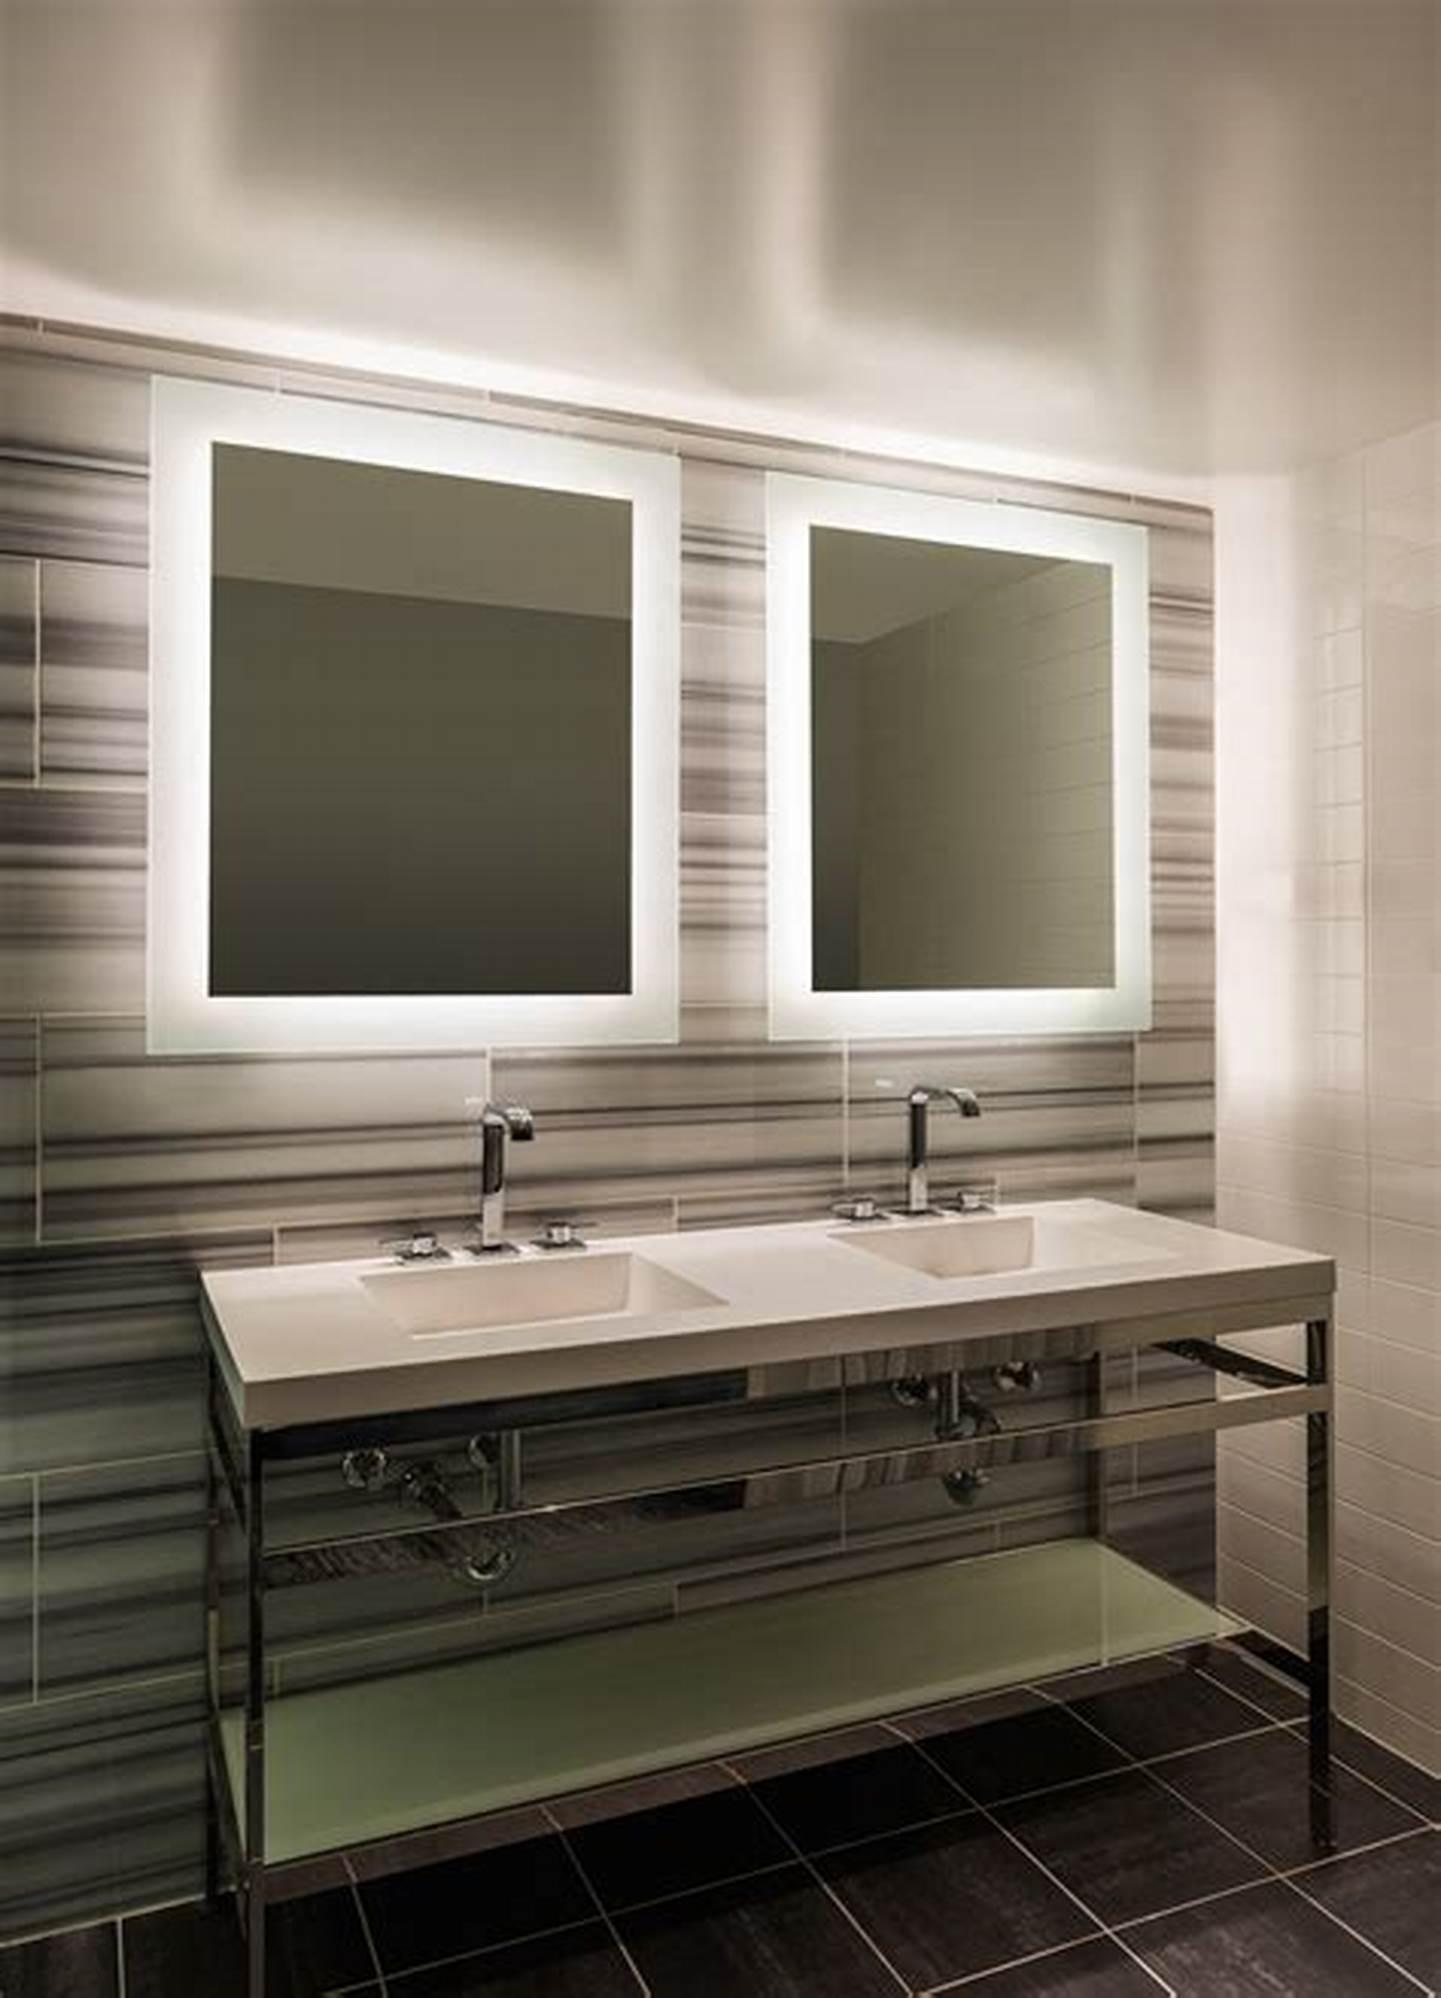 Radisson Inn Electric Lighted Mirror  LED Bathroom Mirror